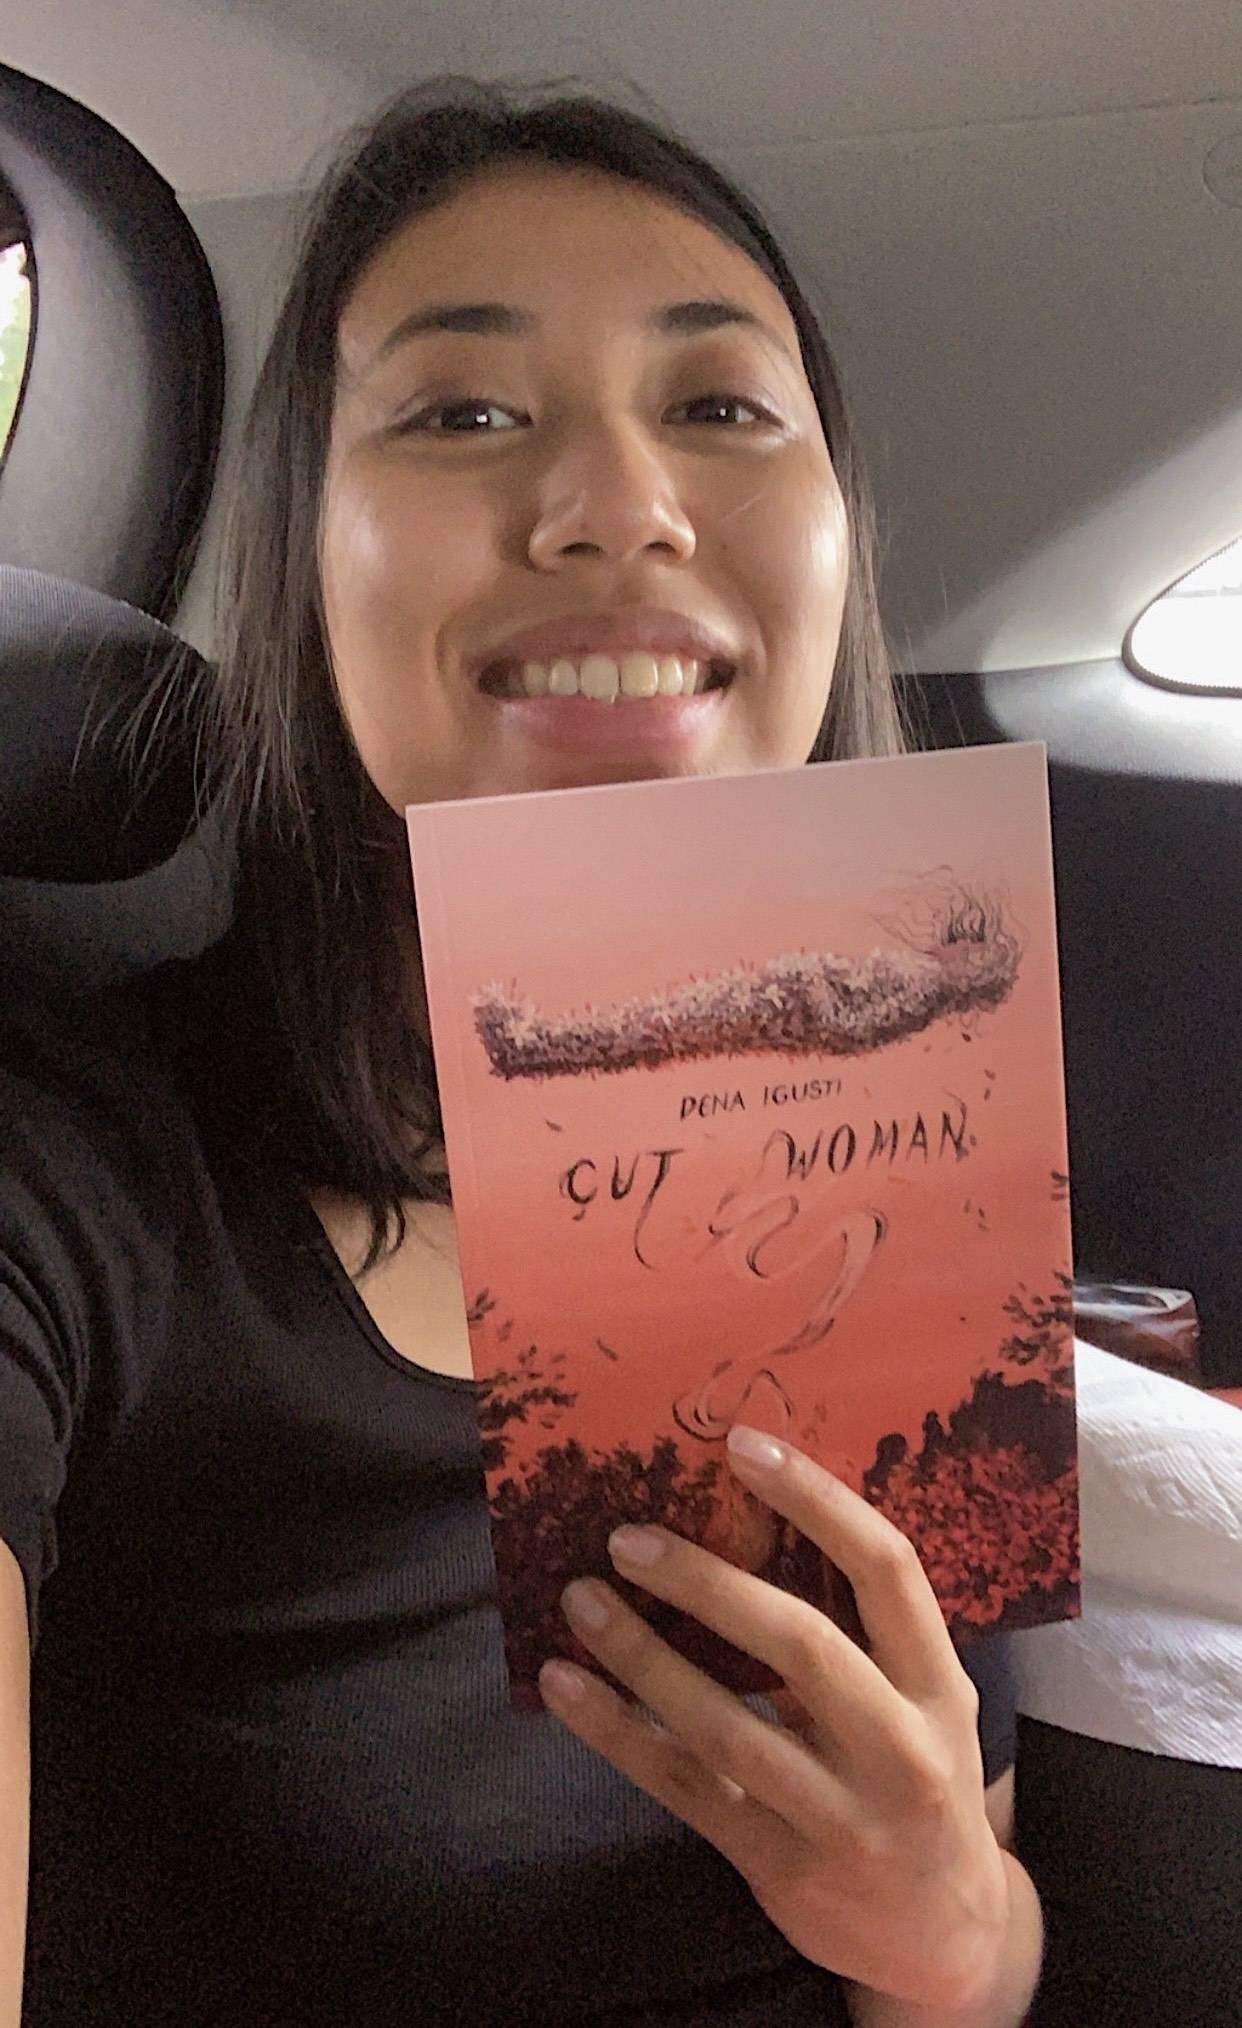 Dena Igusti with her book entitled Cut Woman